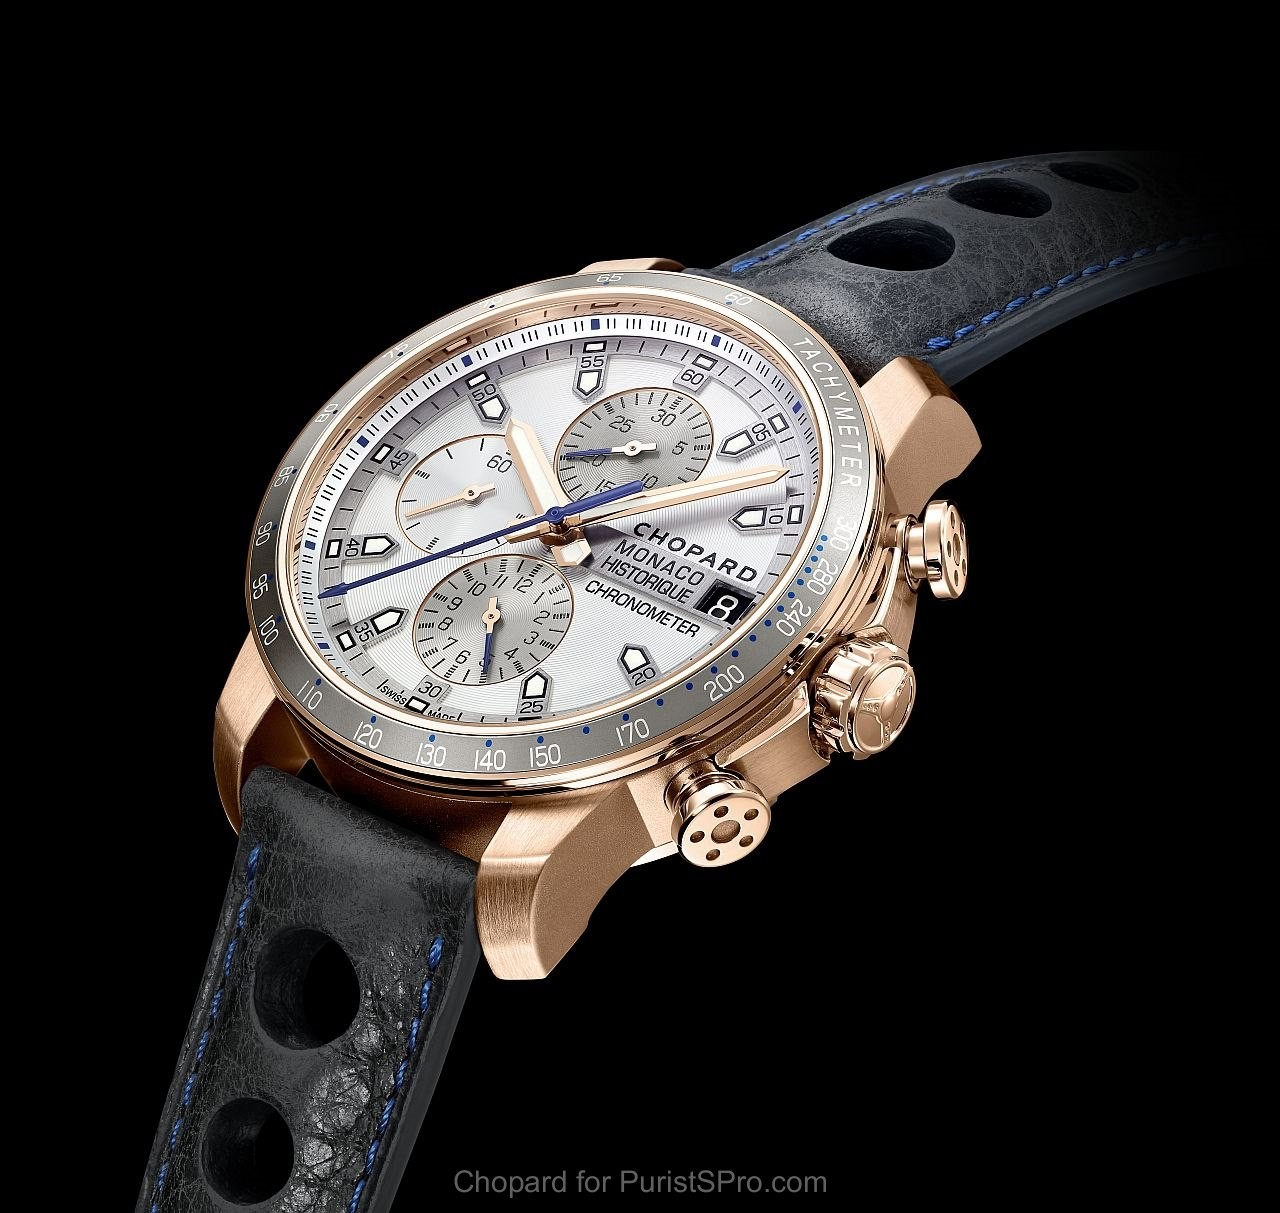 Choaprd Grand Prix de Monaco Historique 2016 Edition Rose Gold